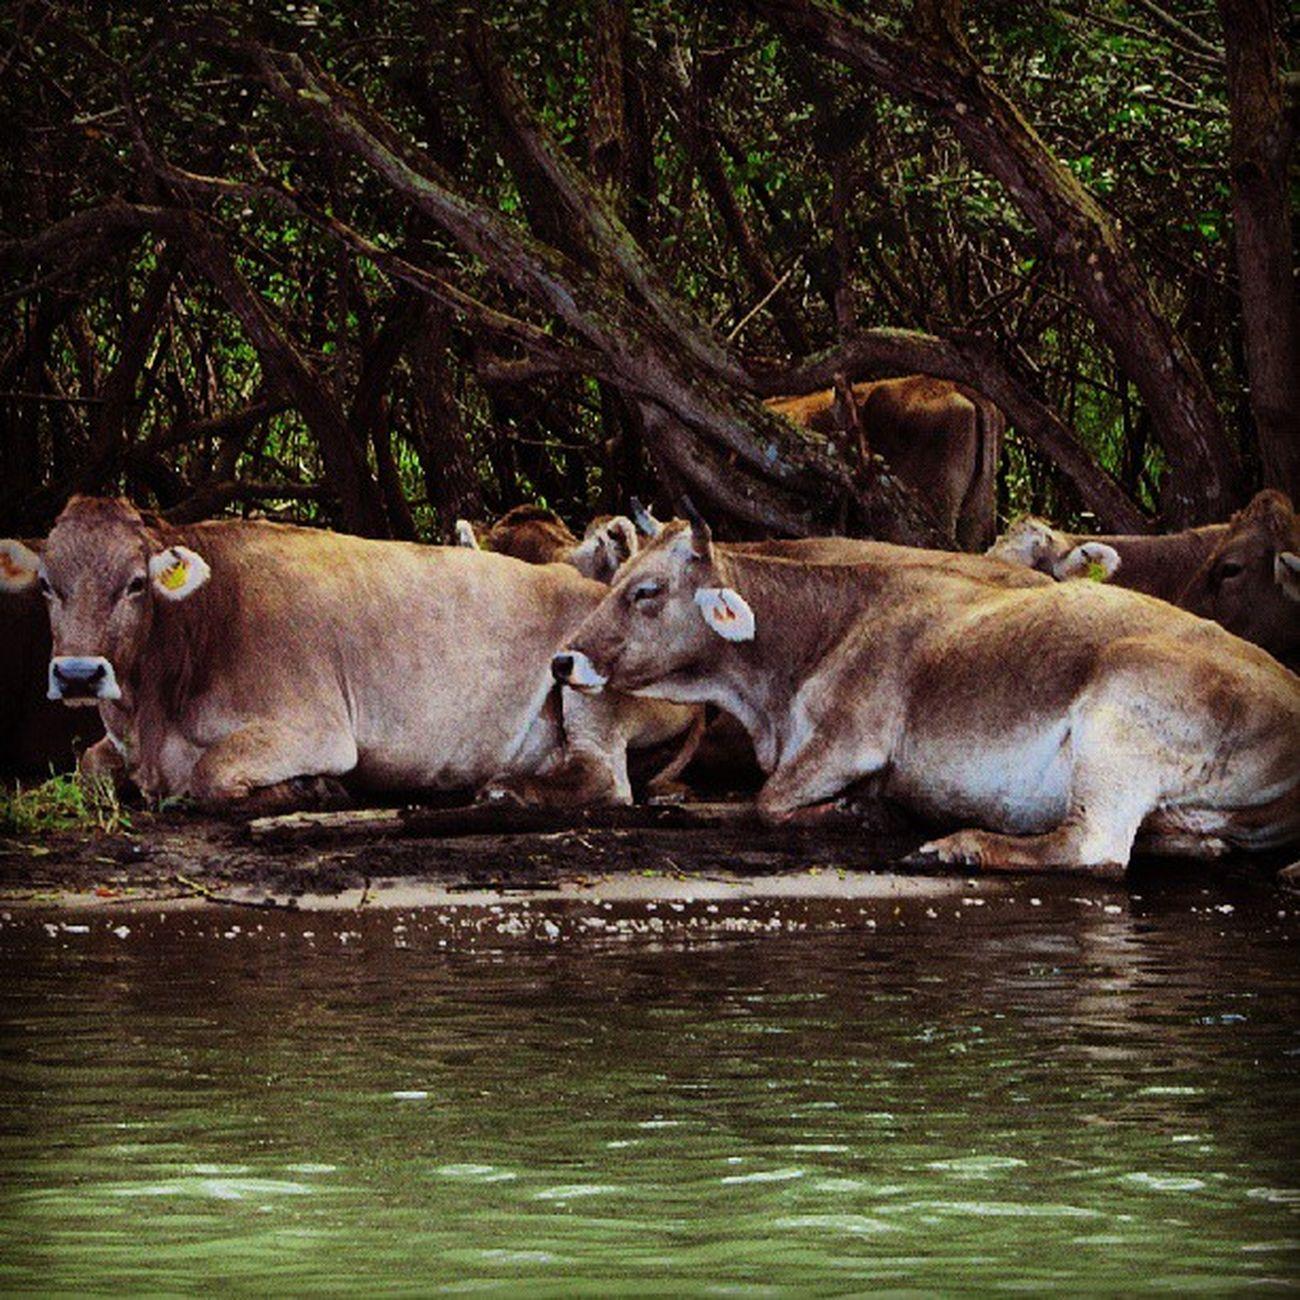 De agua Mexico Veracruz Casitas Playa manglares igersmexico igersveracruz animals cow